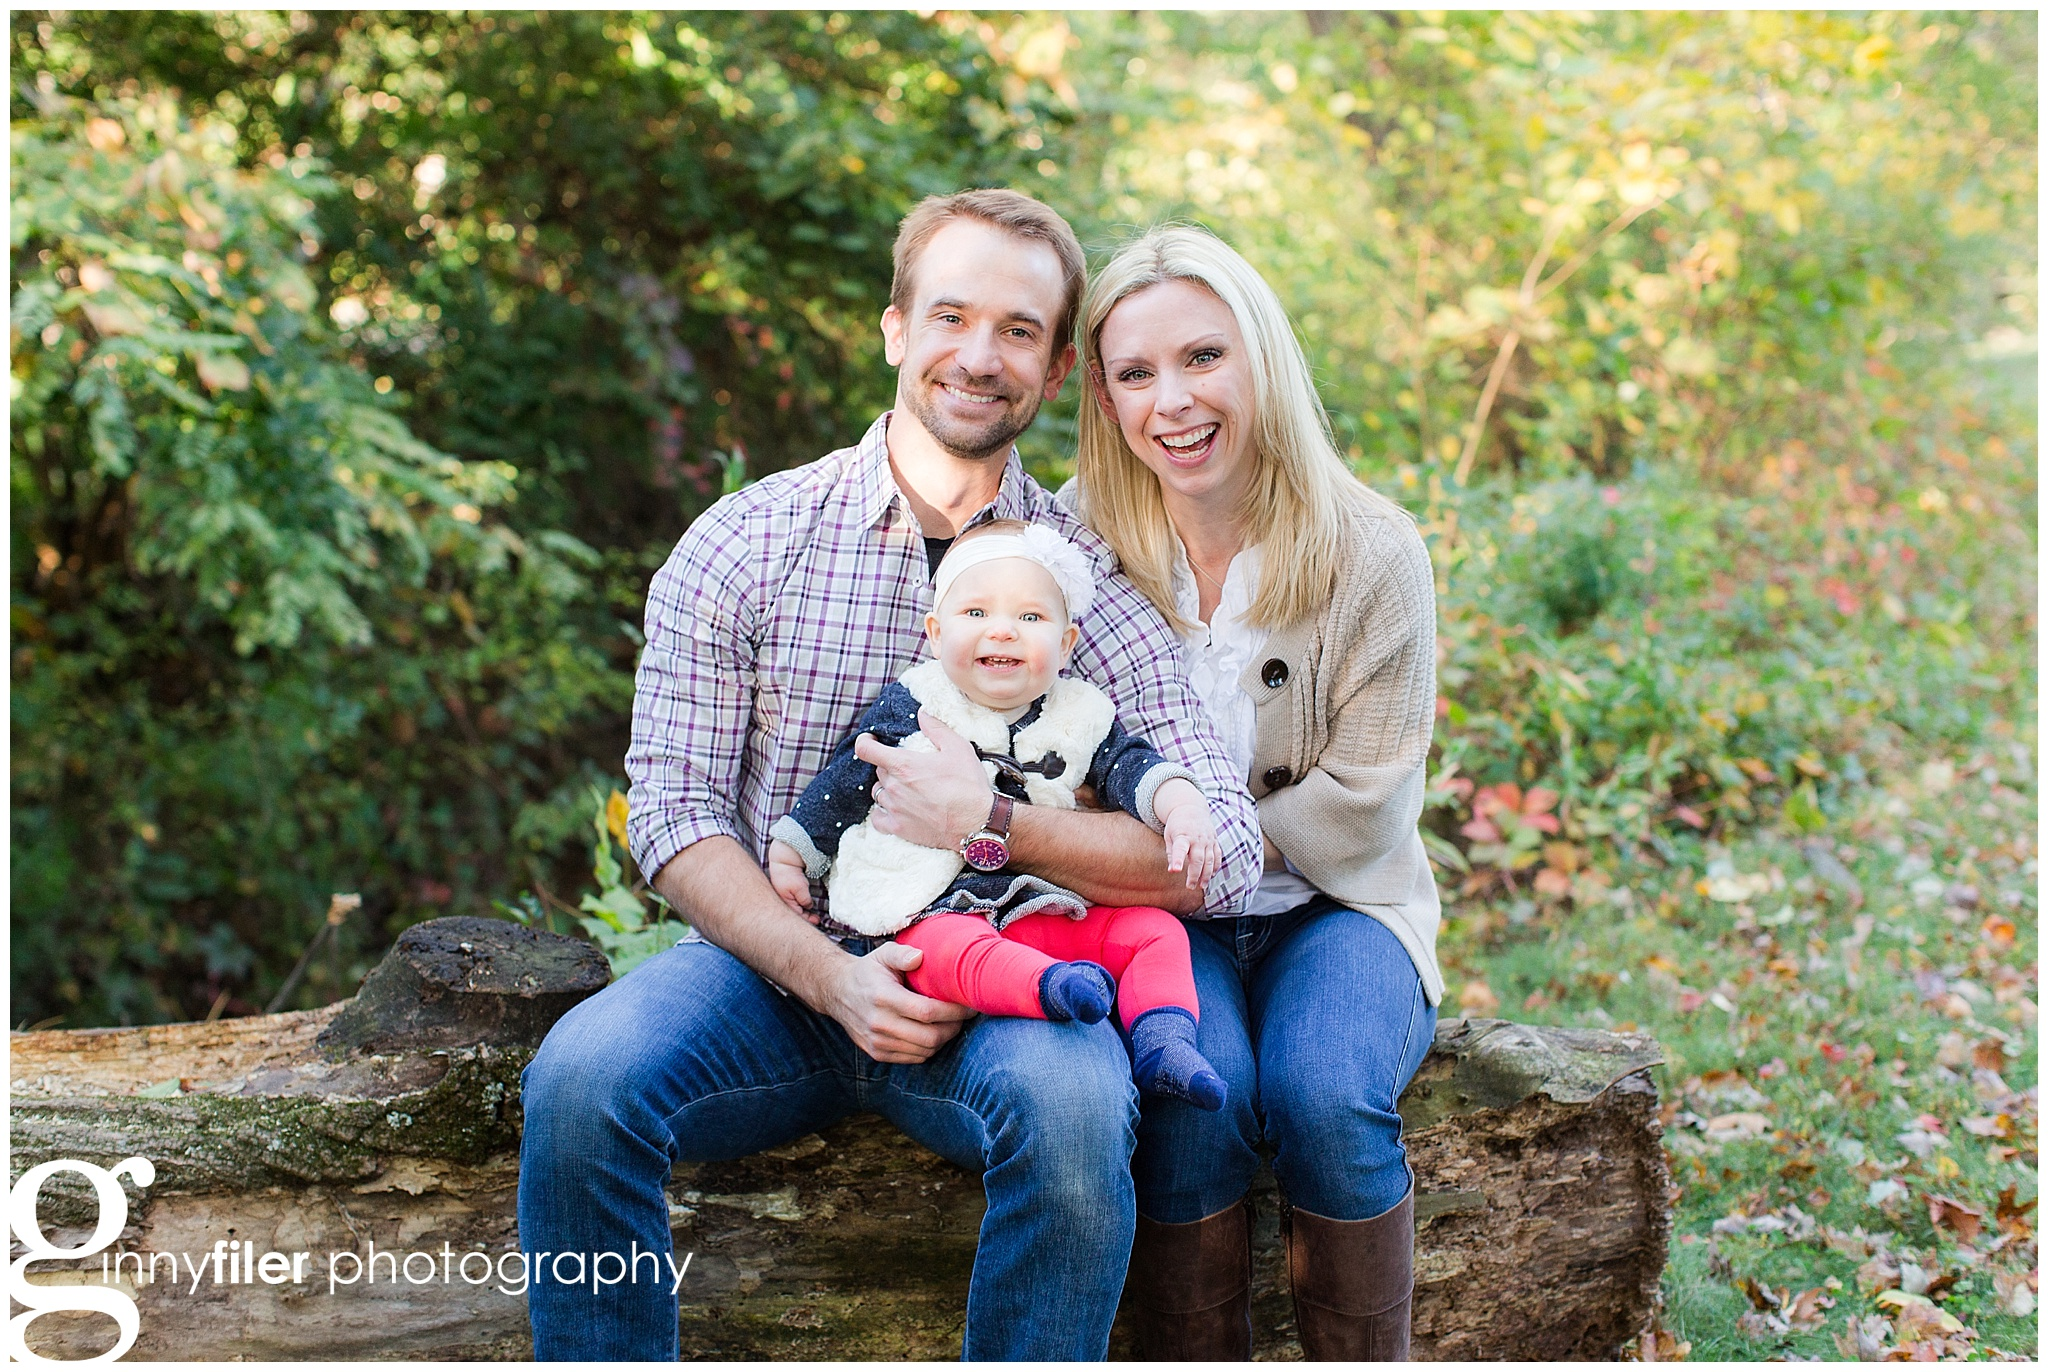 family_photography_klesh_0020.jpg